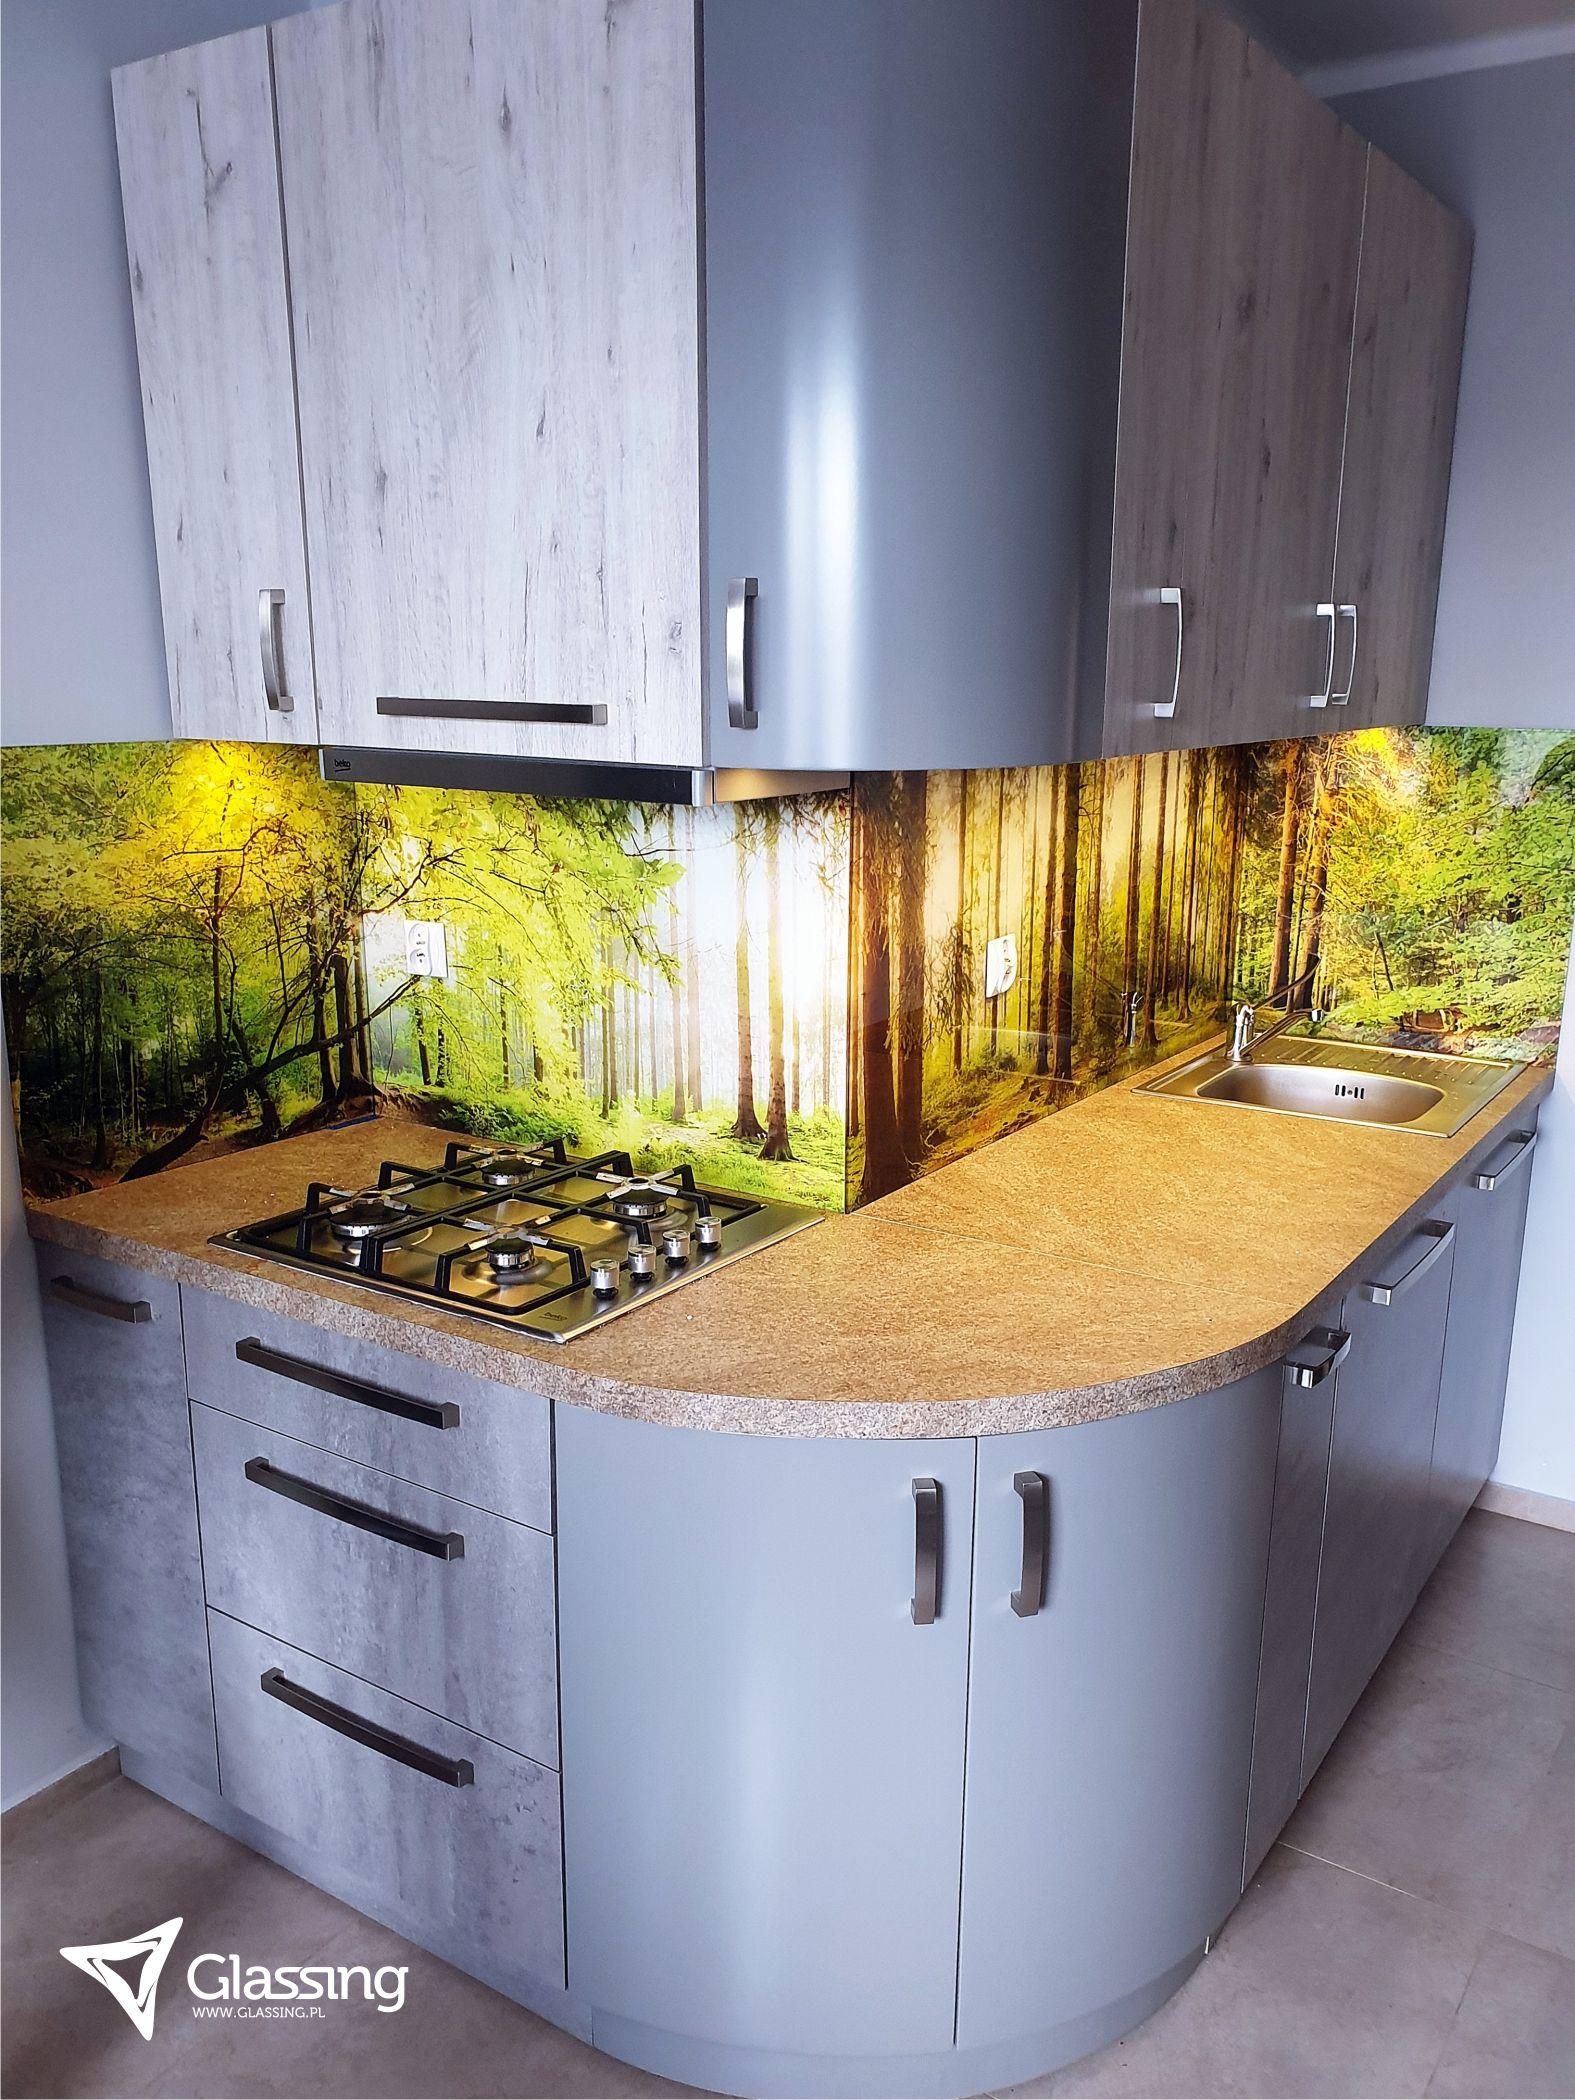 Panele Szklane Kuchenne Panorama Motyw Lesny Las Sloneczny Krajobraz Natura Dekoracja Kuchni Kitchen Decor Home